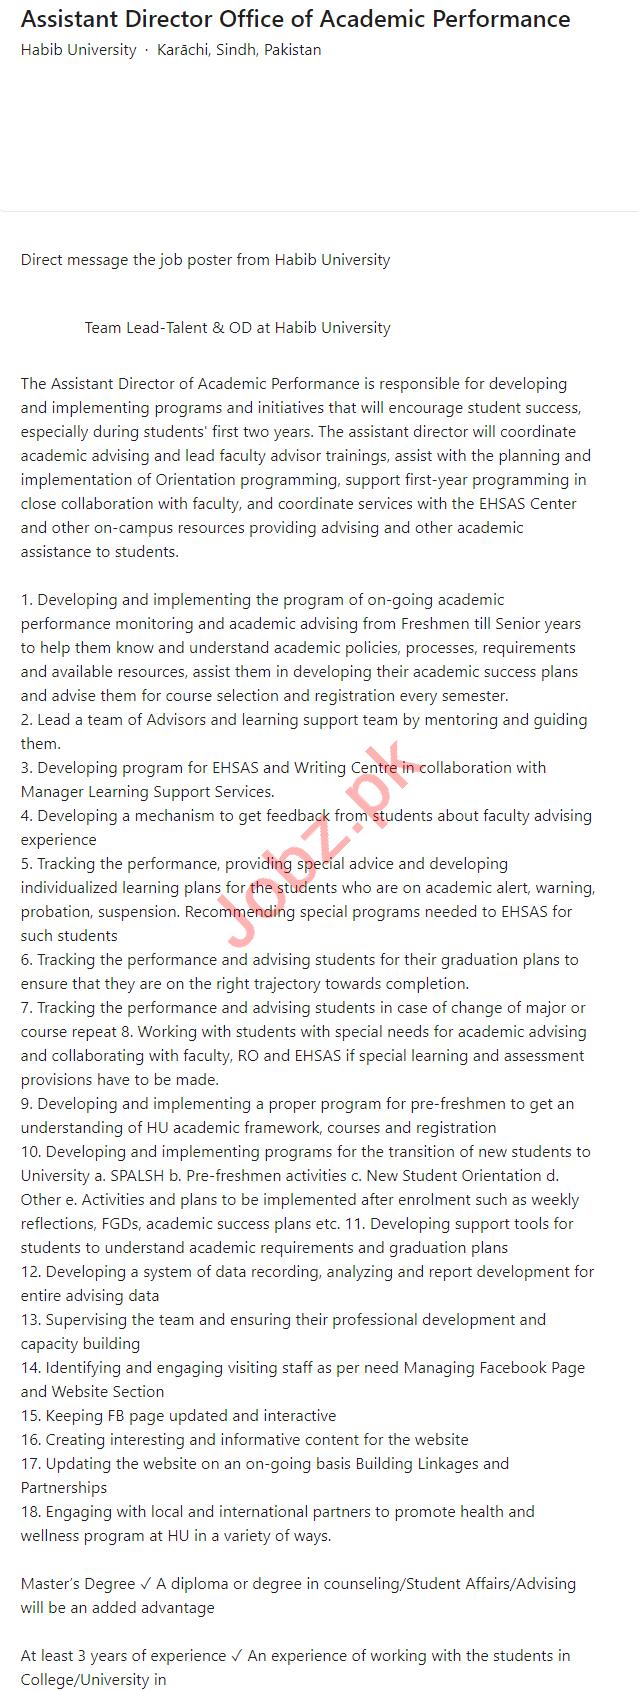 Habib University HU Karachi Jobs 2021 for Assistant Director